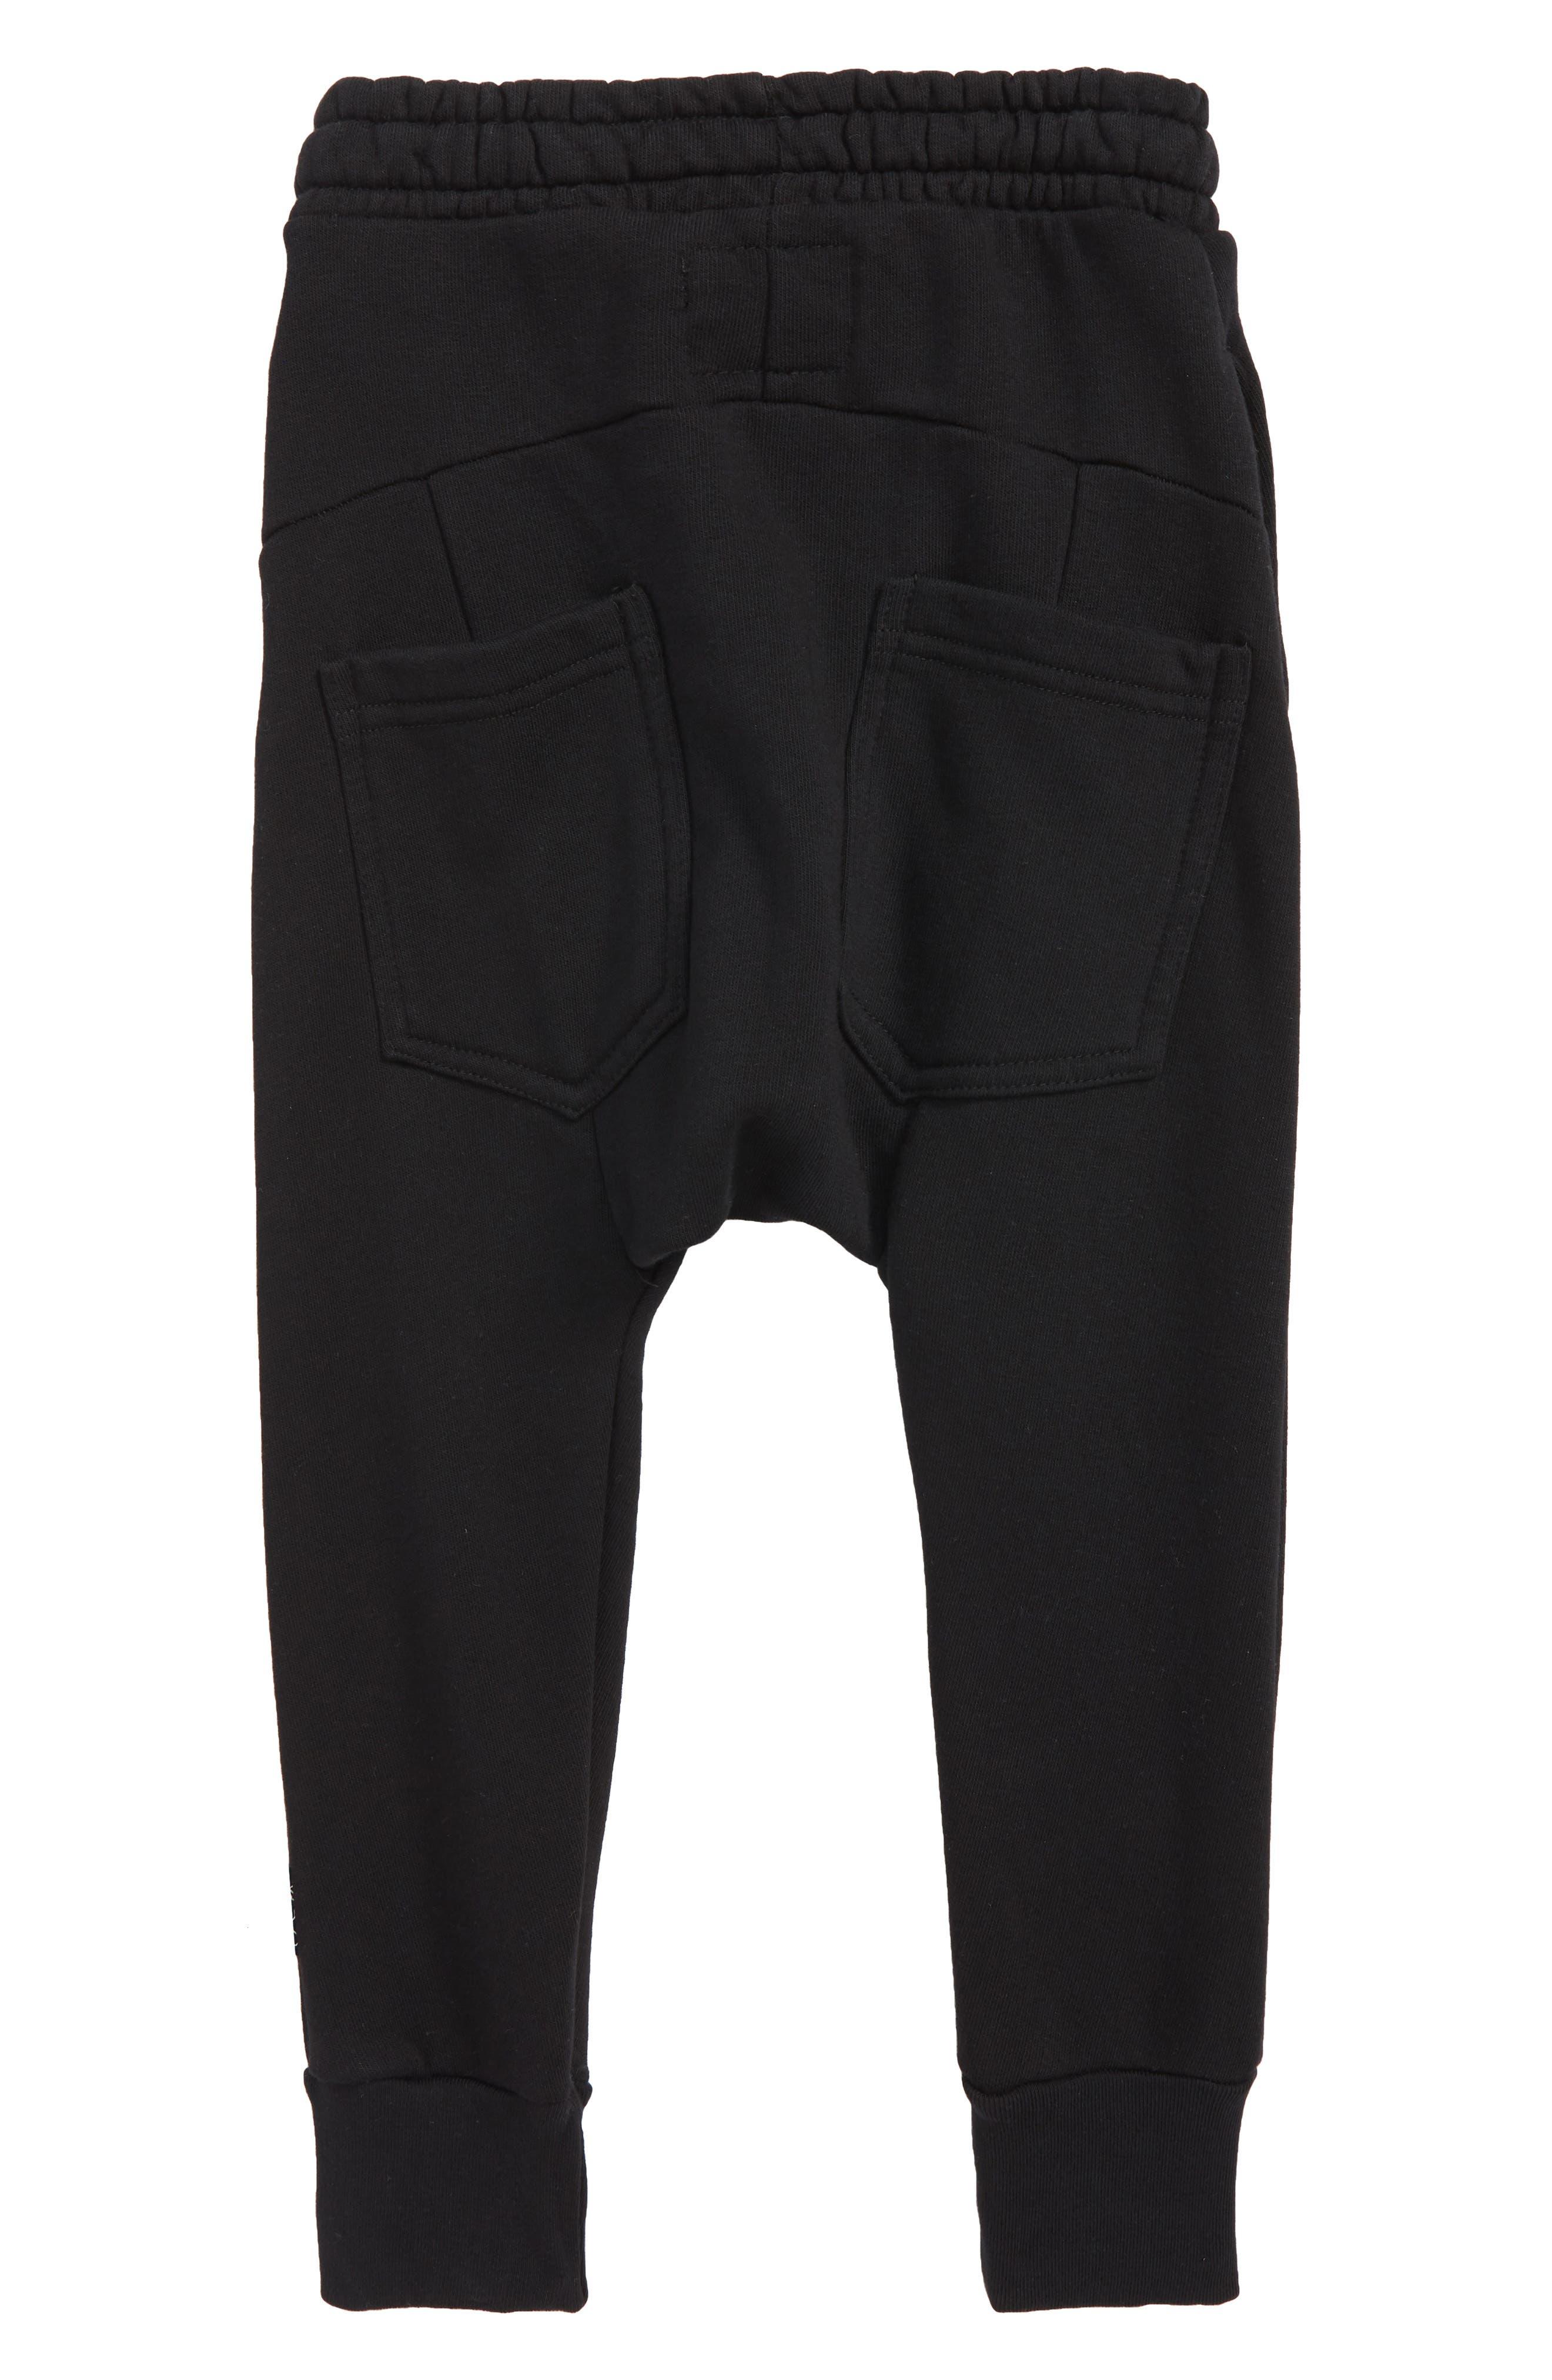 Basic Sweatpants,                             Alternate thumbnail 2, color,                             001